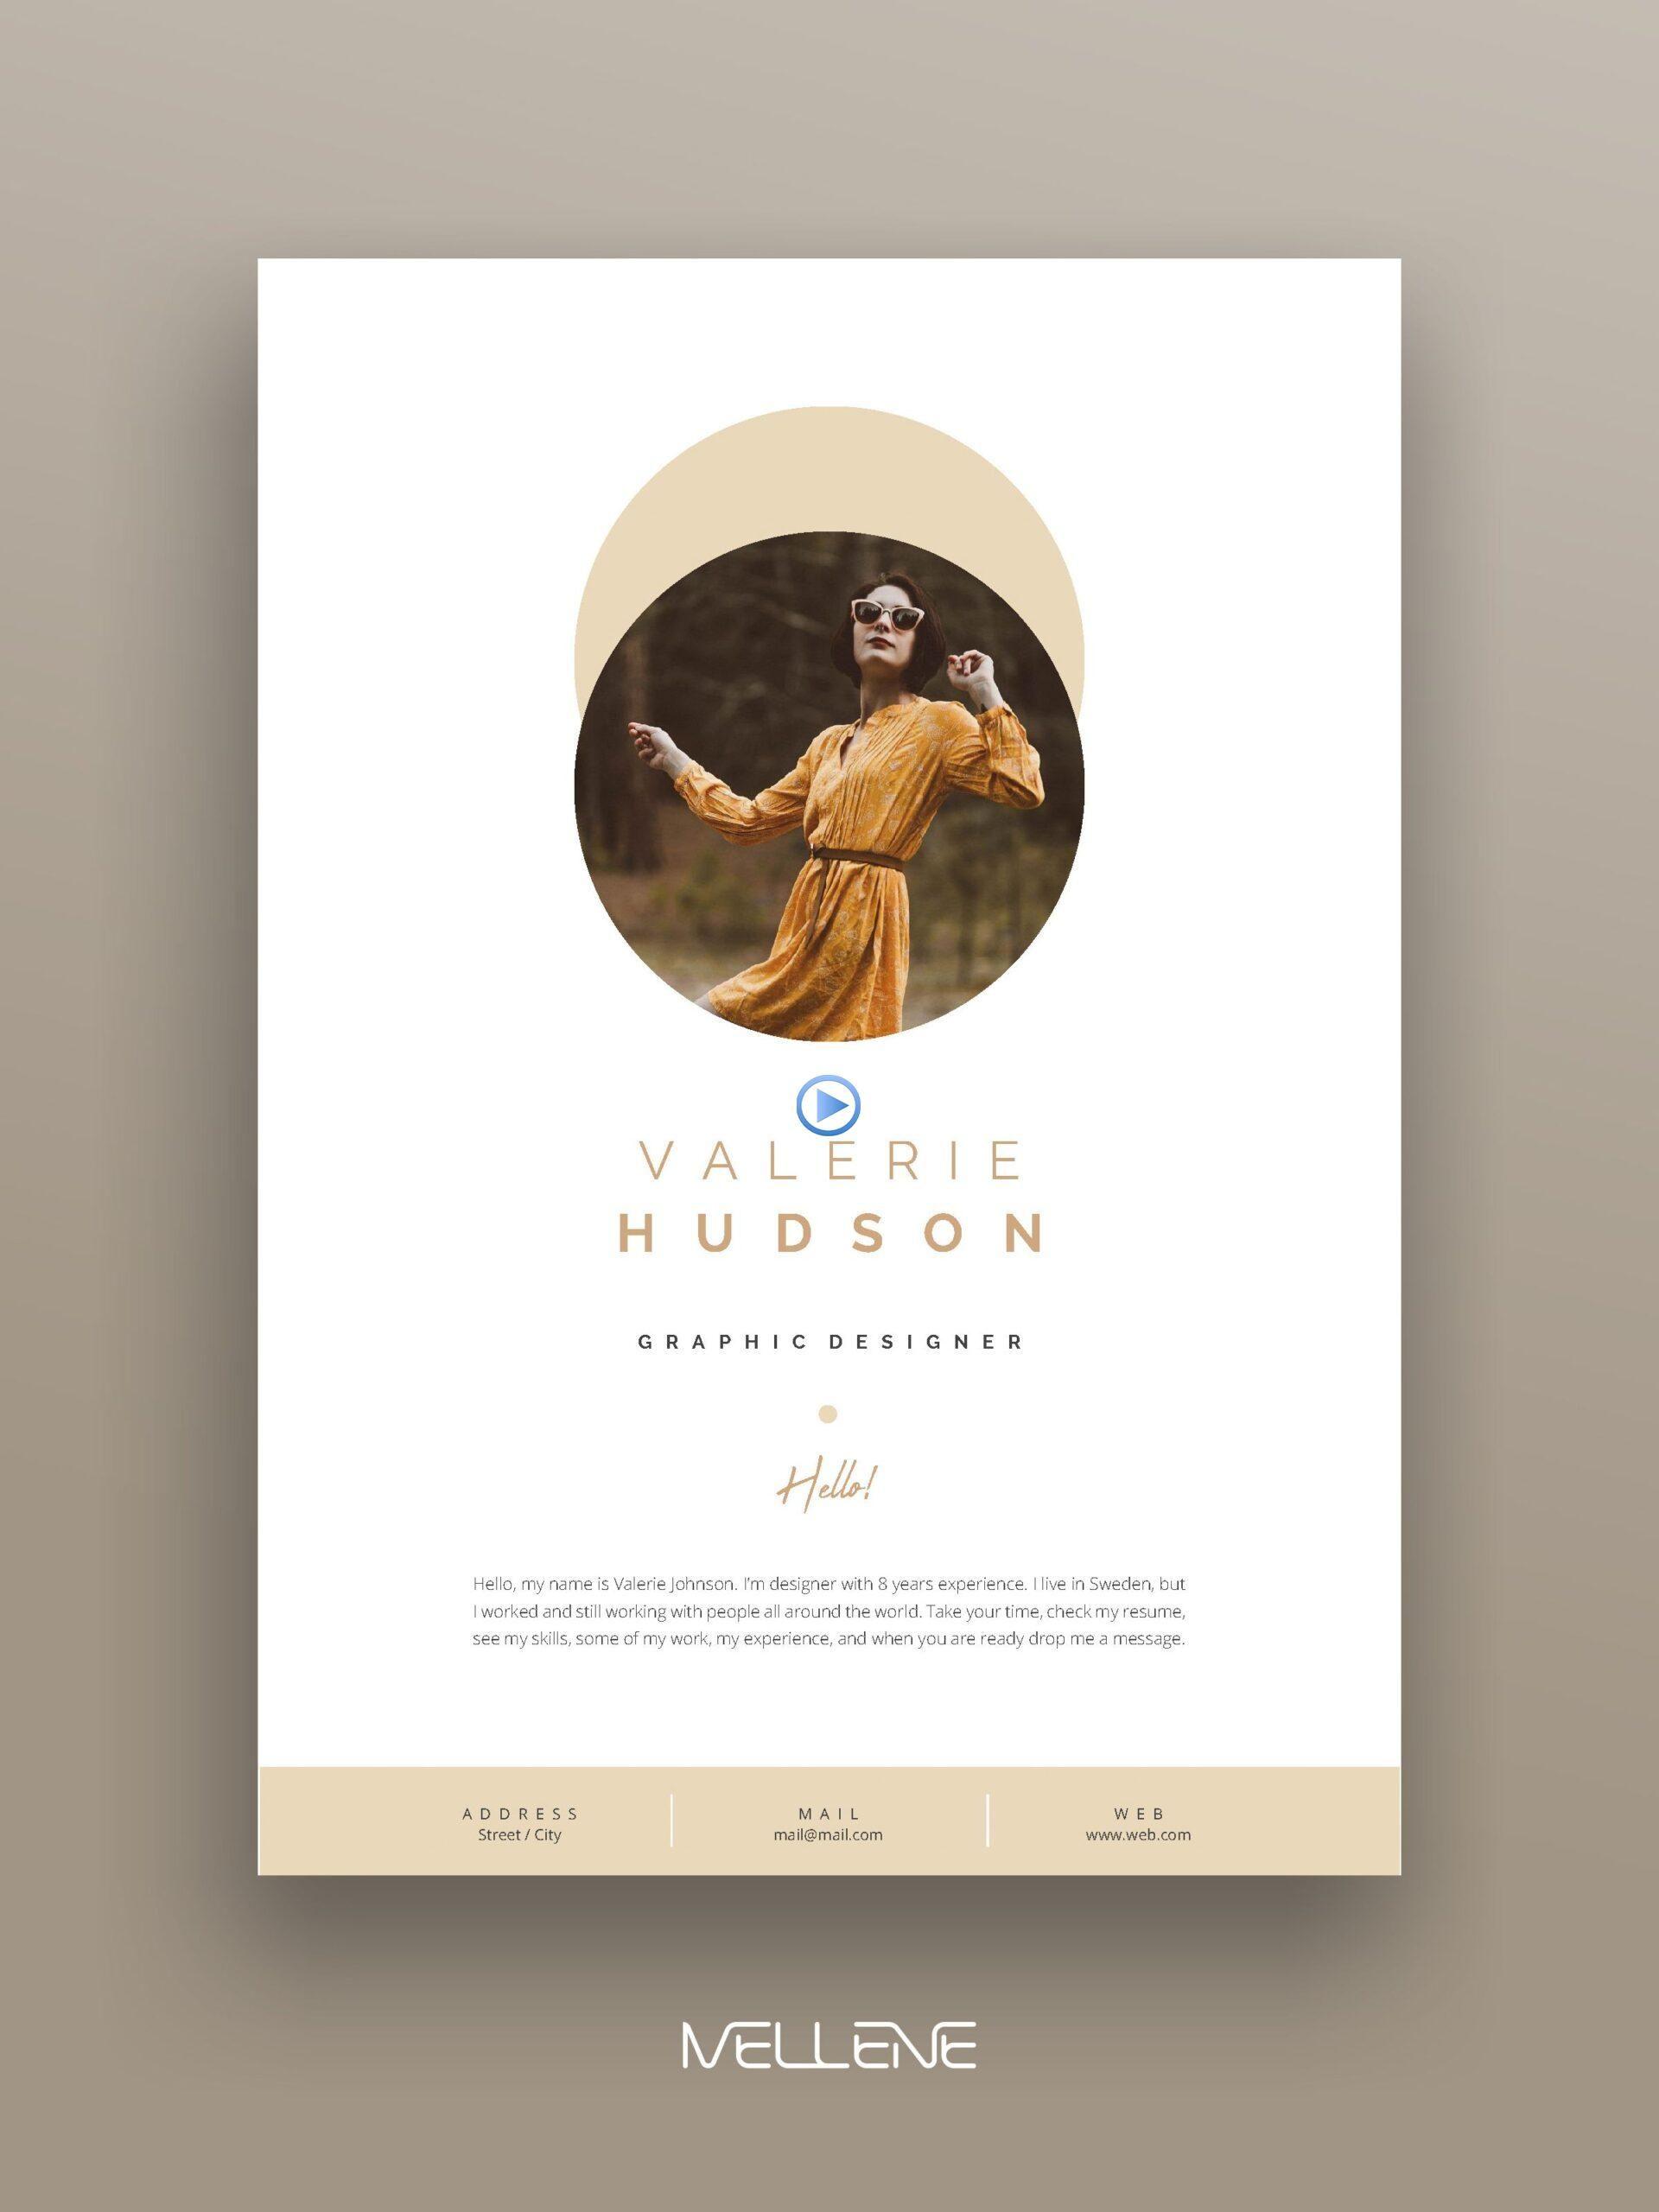 Cv Resume Template For Ms Word Professional Cover Letter Self Presentation Portfolio Desi Graphic Design Layouts Cv Design Portfolio Design